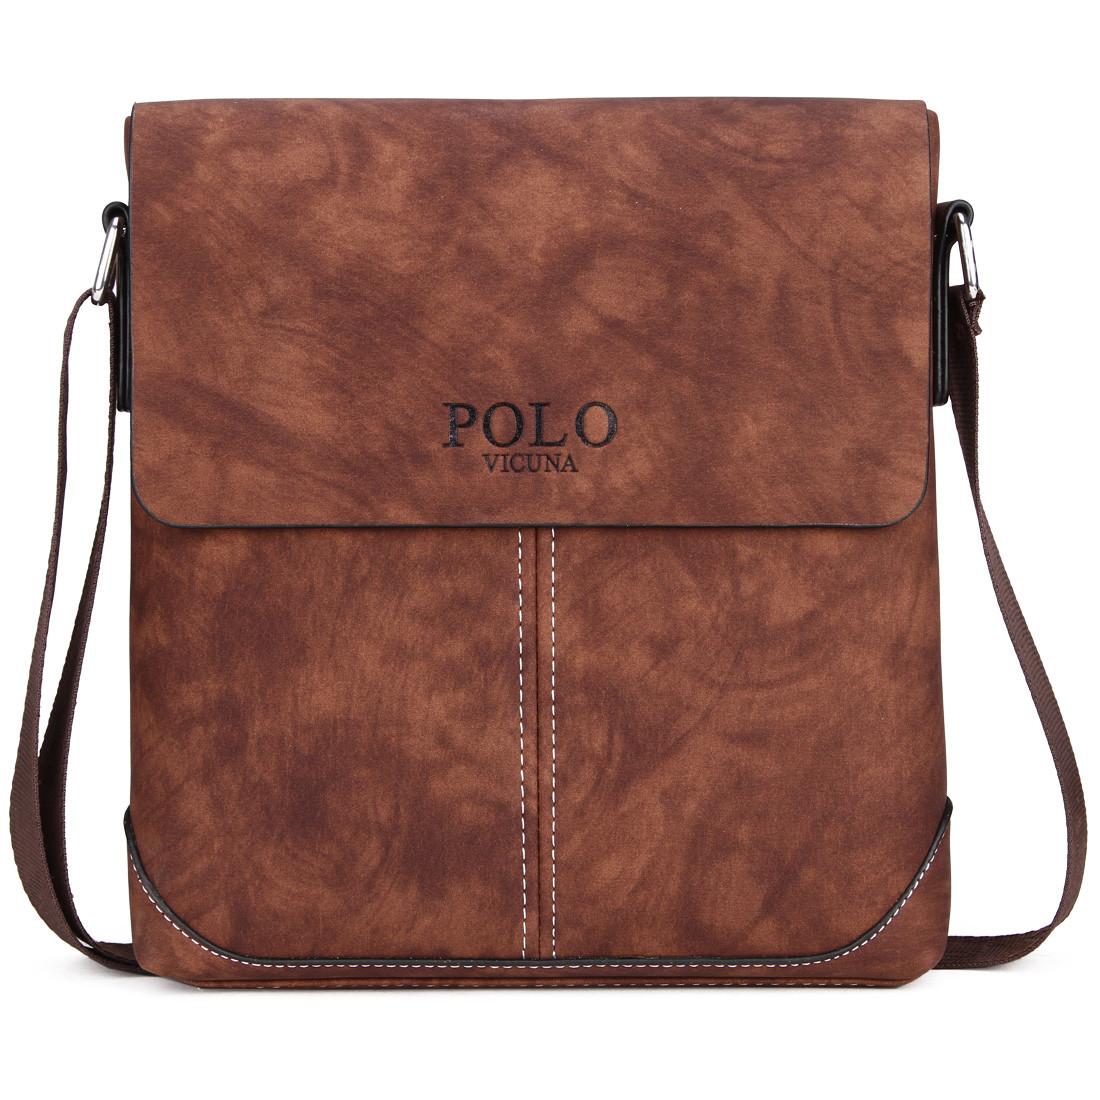 2e02b539cdd9 Мужская сумка Polo Vicuna коричневая (8827-BR): продажа, цена в Буче ...